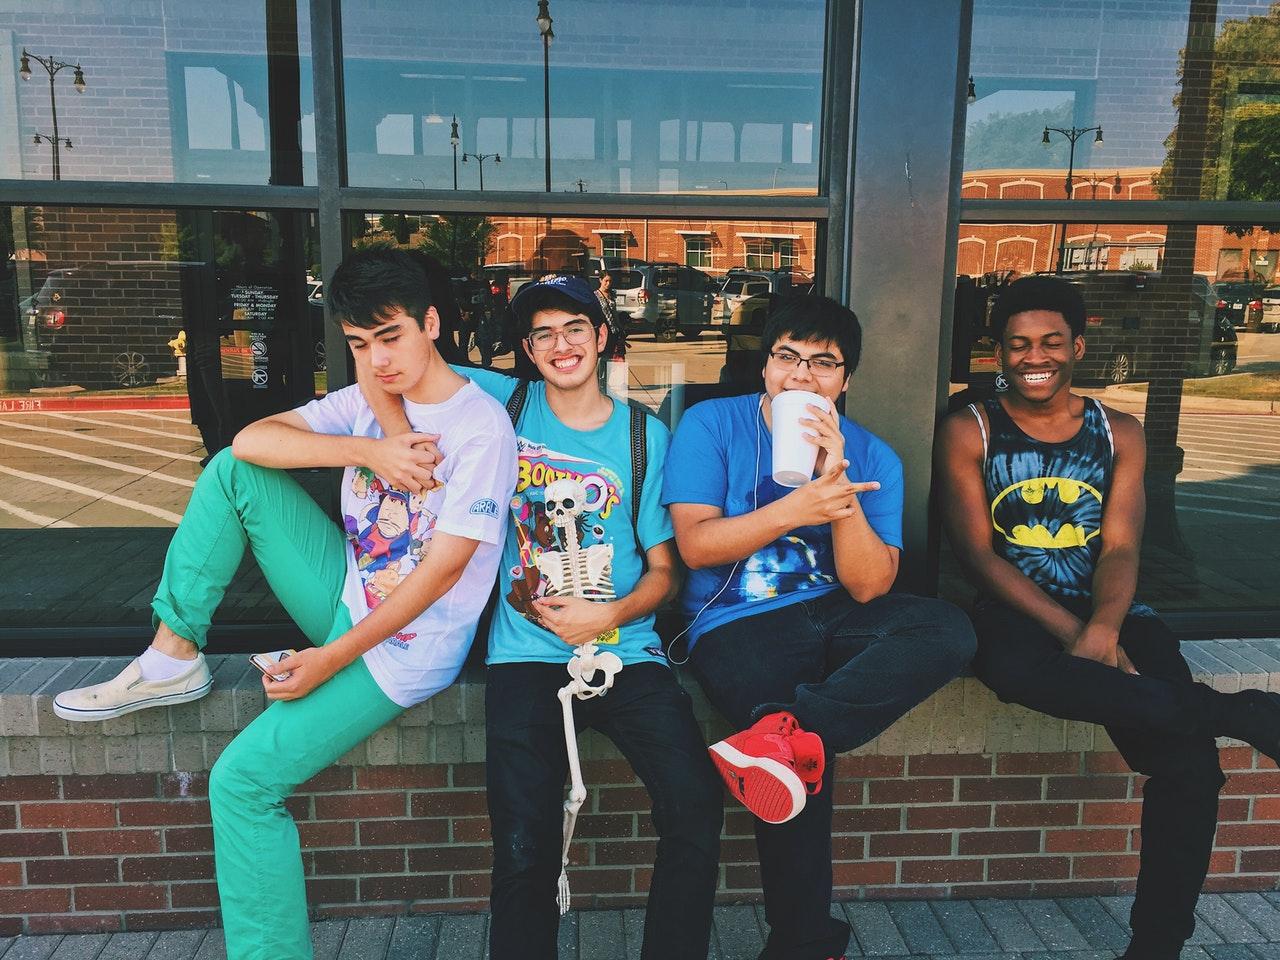 group of teenage boys